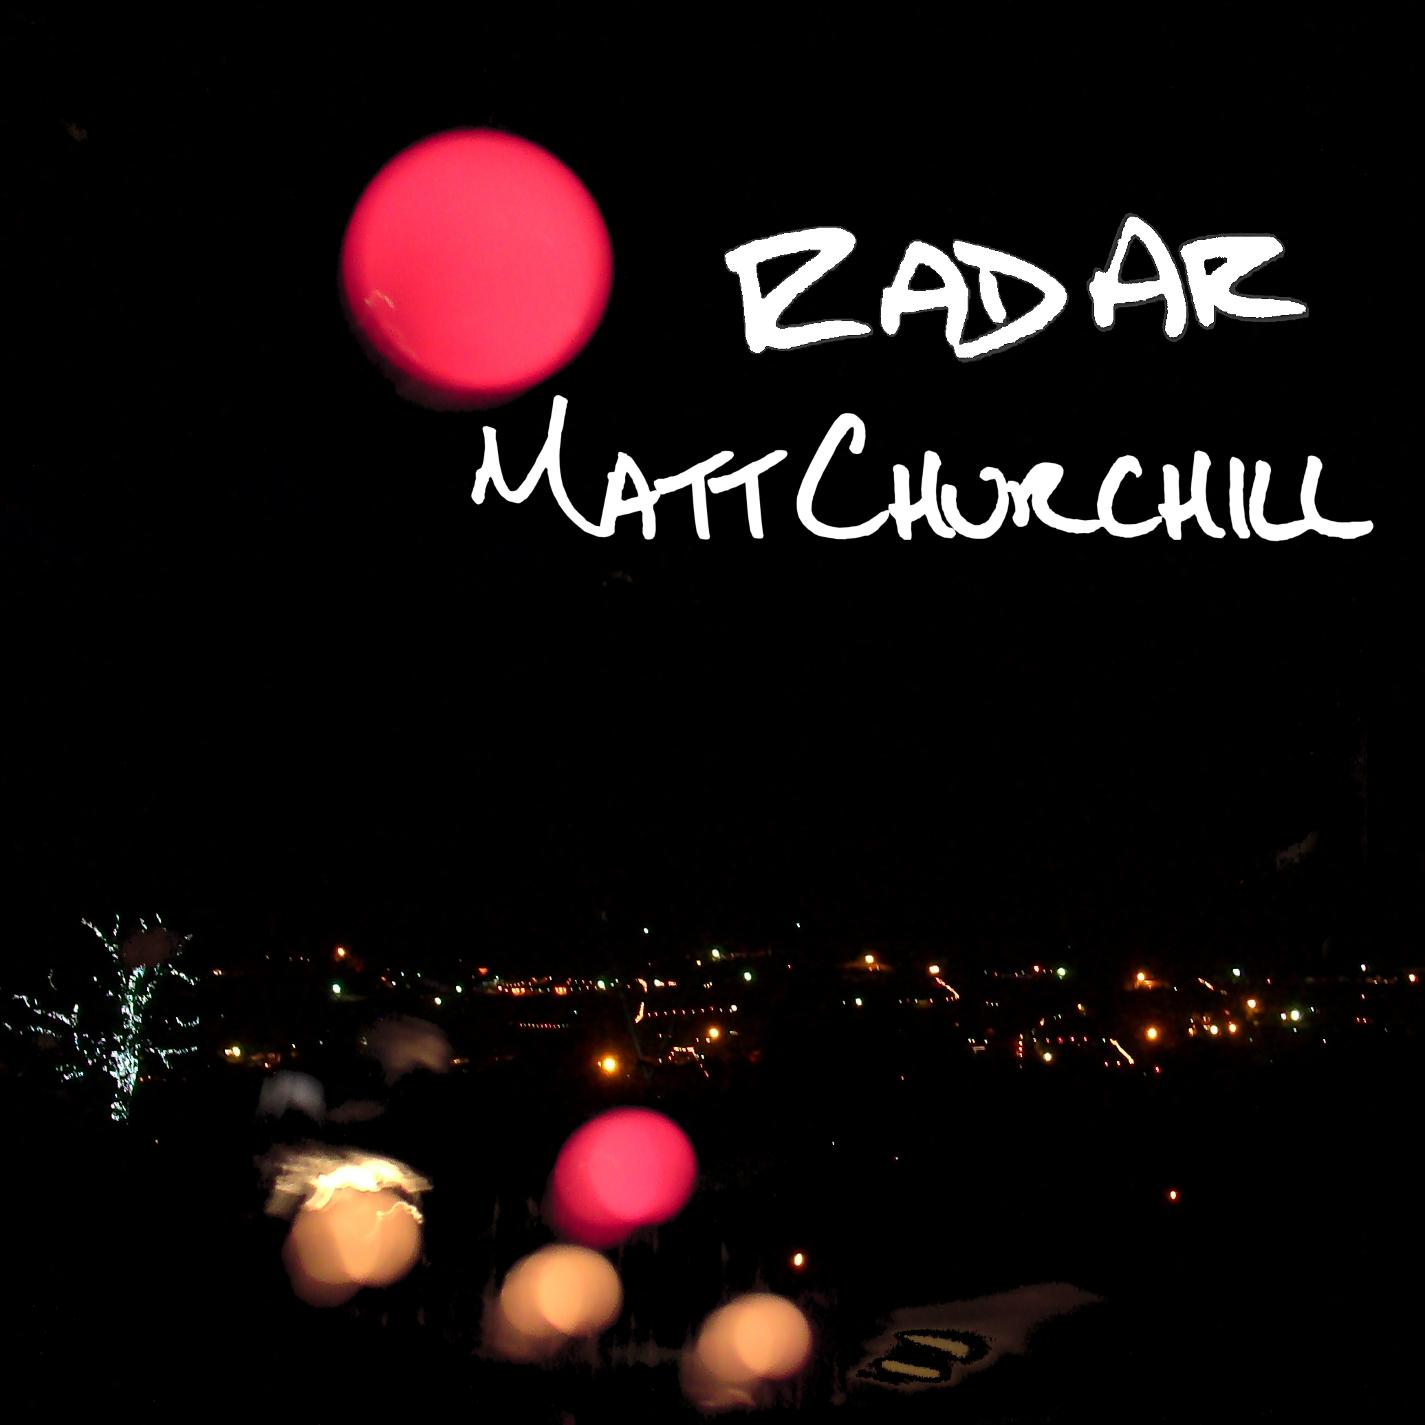 Radar (single) - Released January 28th 2013